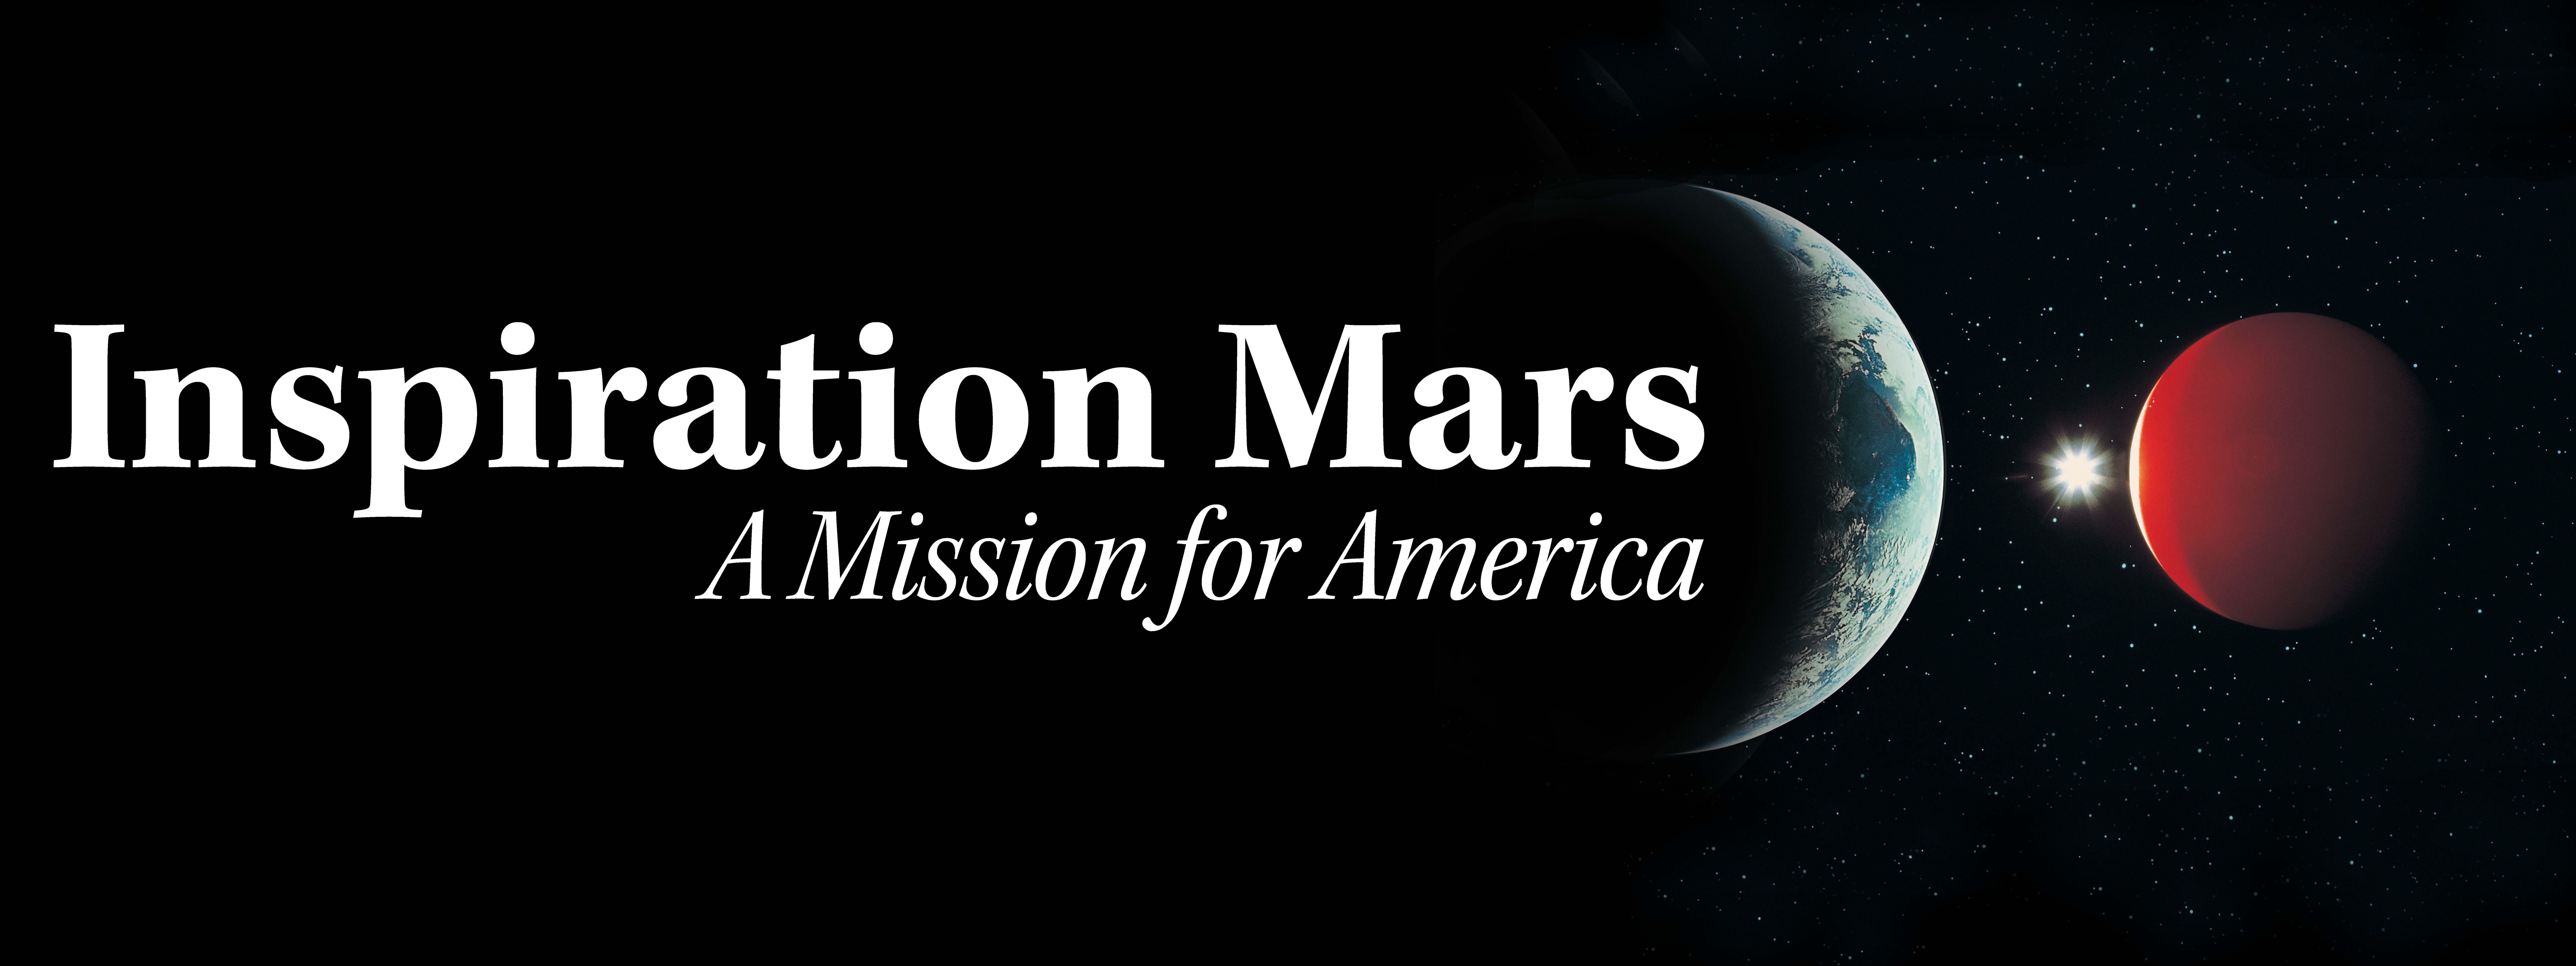 inspiration mars mission - photo #12